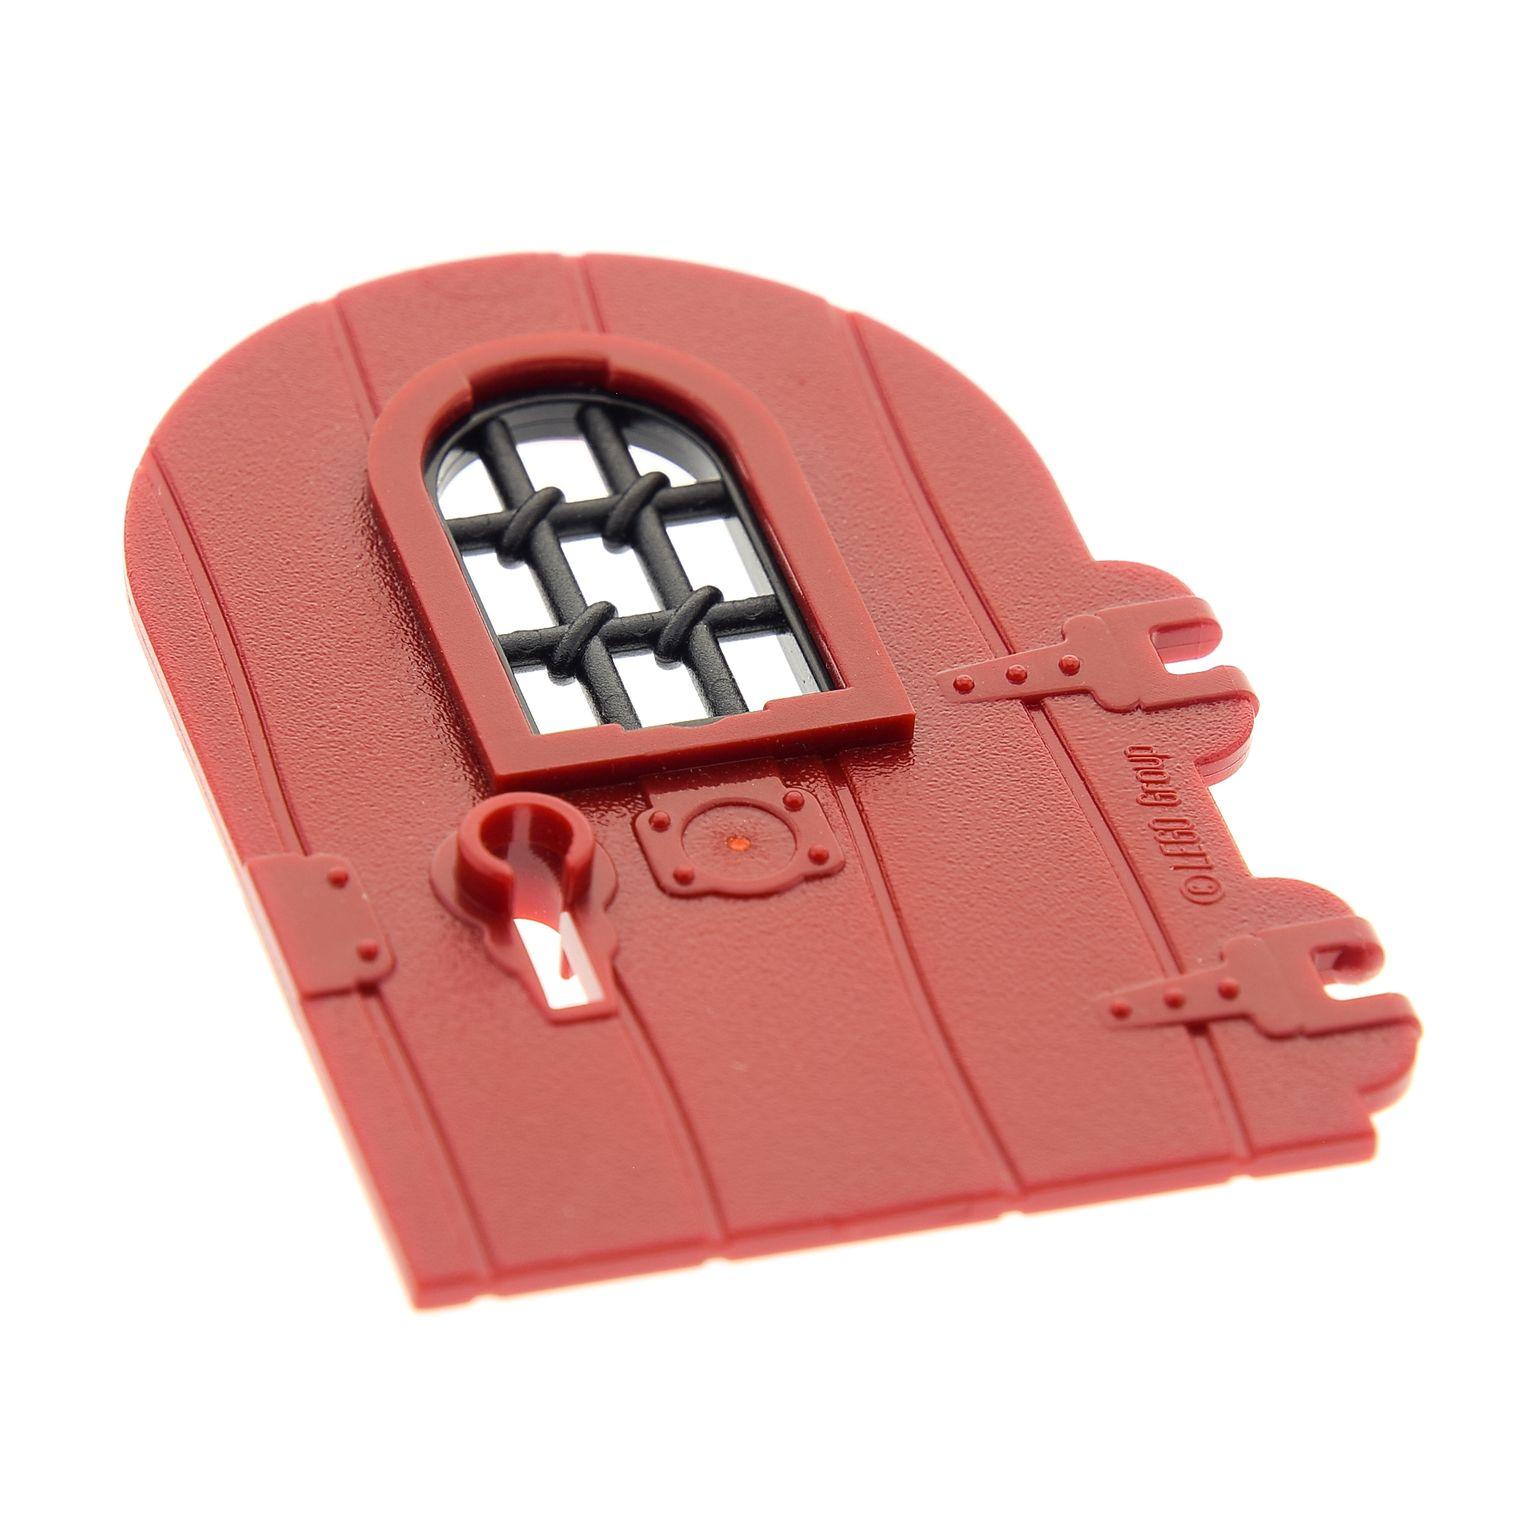 1 x Lego System Freestyle Haustür Tür Blatt creme weiss 1x6x6 Fenster Gitter 600